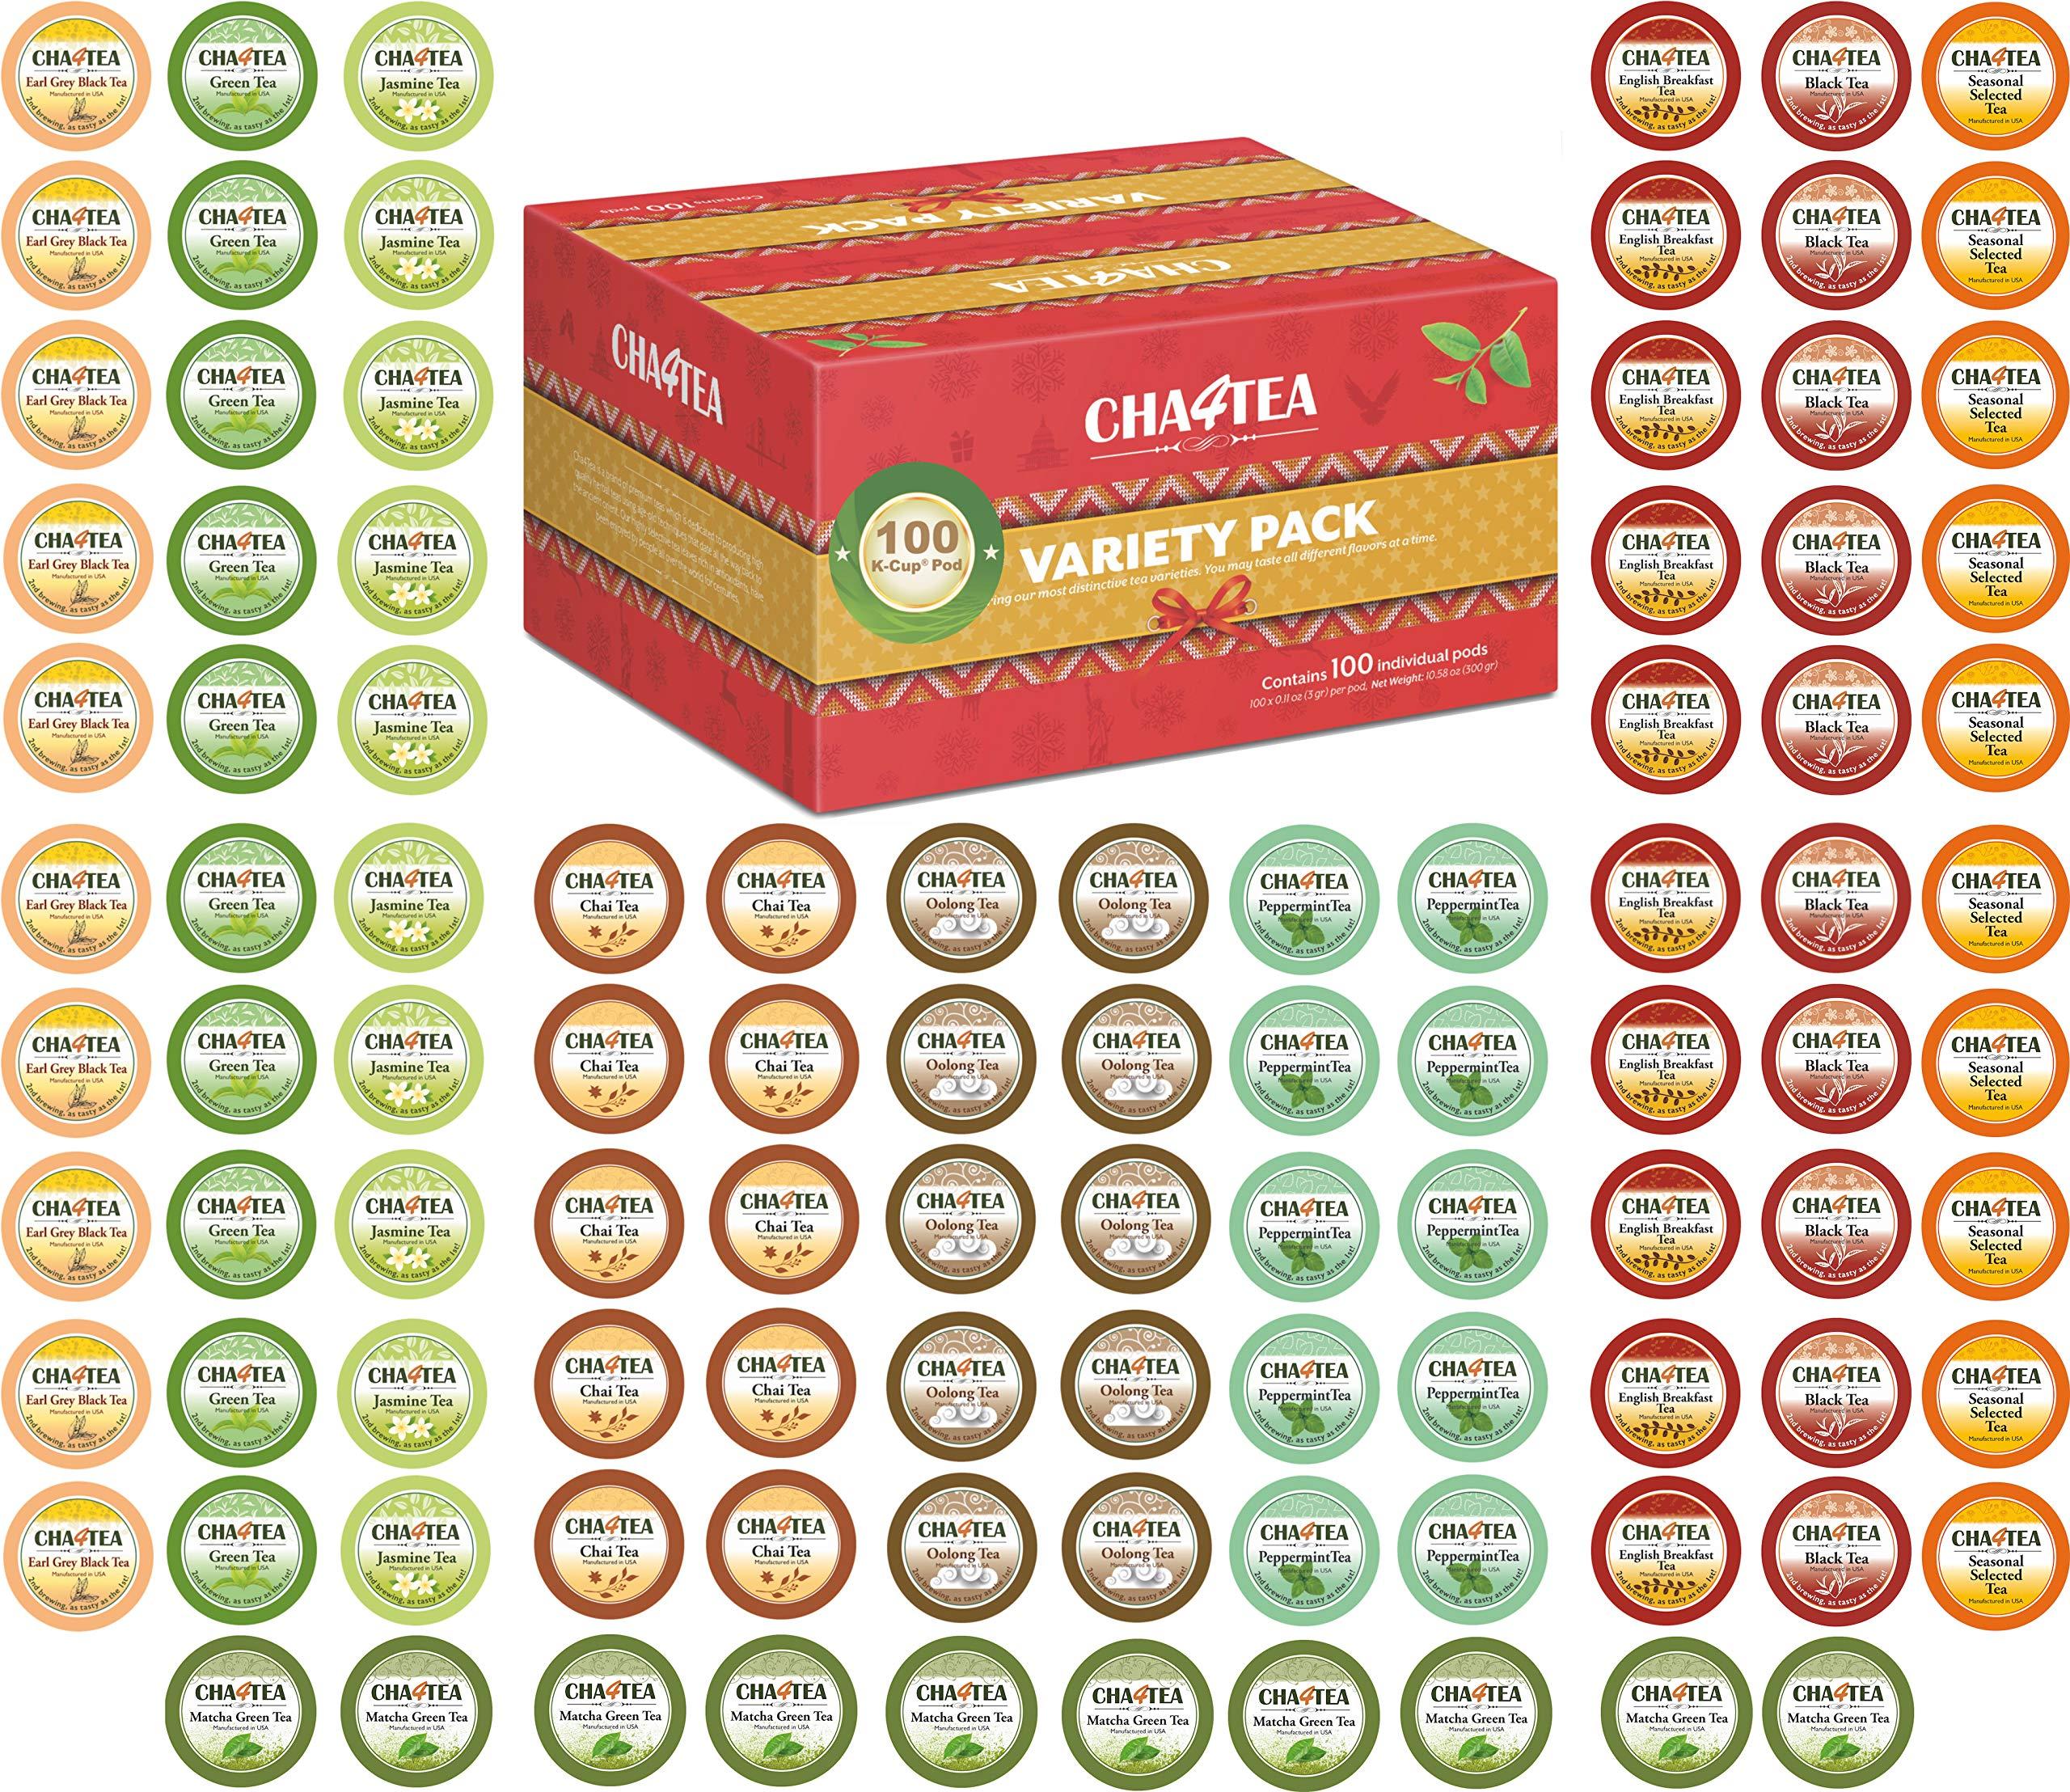 Cha4TEA 100-Count Tea Variety Sampler Pack for Keurig K-Cup Brewers, Multiple Flavors (Green Tea, Black Tea, Jasmine, Earl Grey, English Breakfast, Oolong Green Tea, Peppermint, Chai Tea) by CHA4TEA